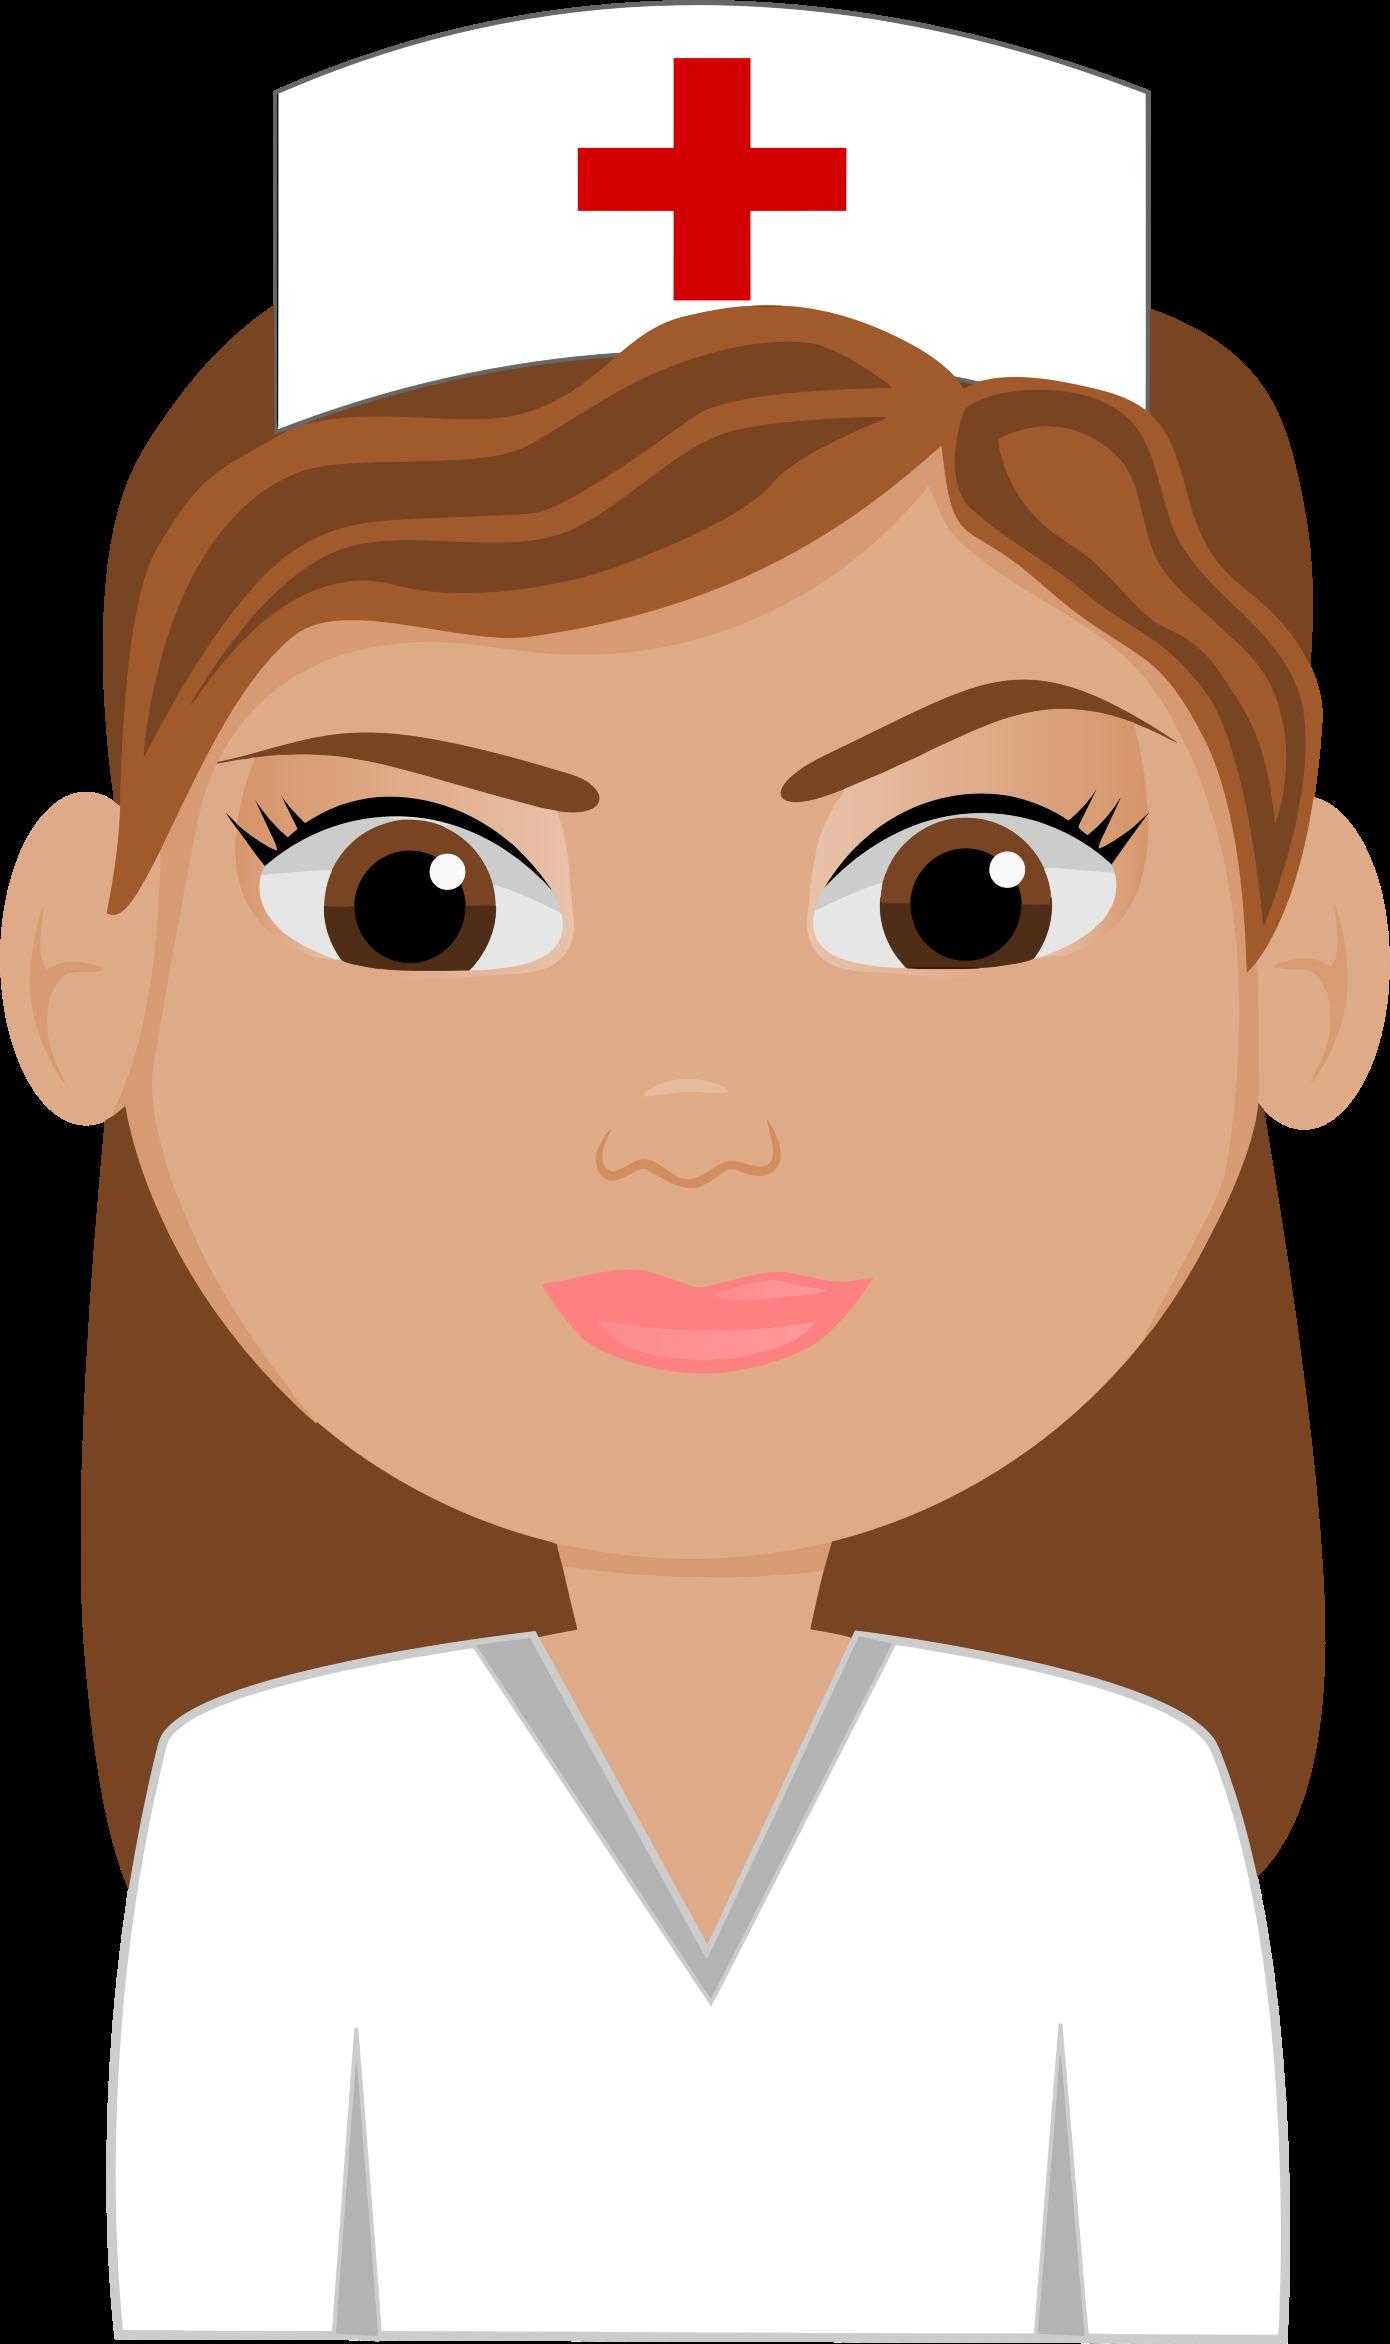 Avatar icons png free. Nurse clipart cartoon